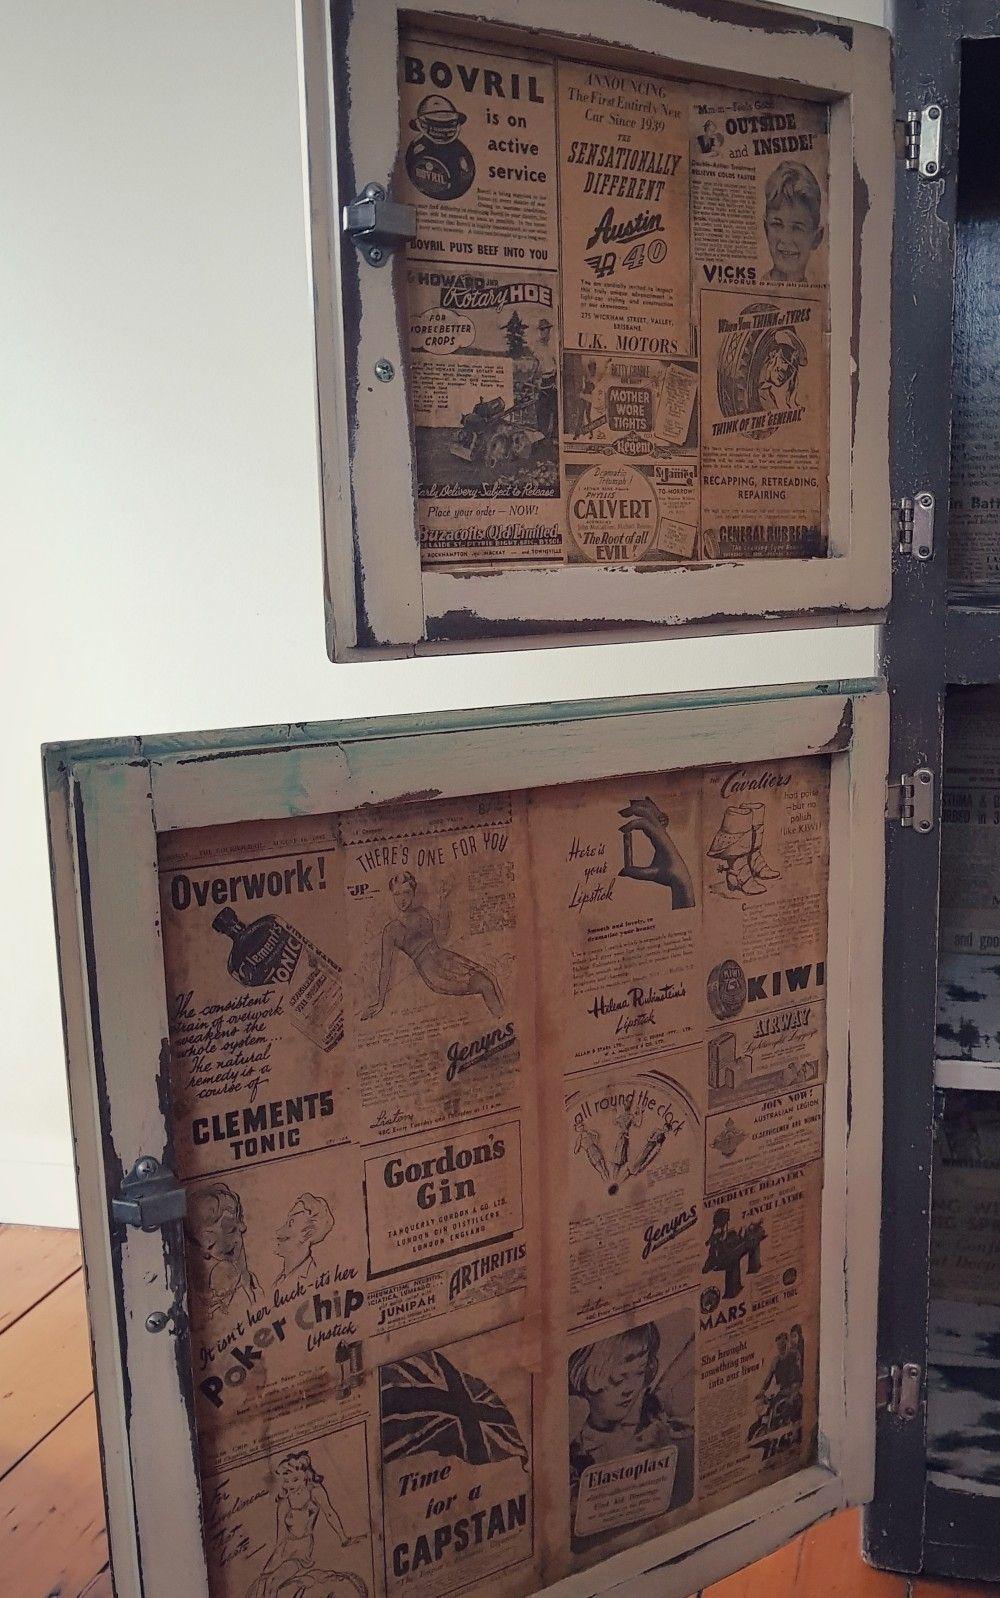 Decoupaged Original 1940 S Newspaper Advertisements Onto The Inside Of A Vintage Retro Kitch Diy Furniture Projects Furniture Projects Kitchen Cabinet Doors